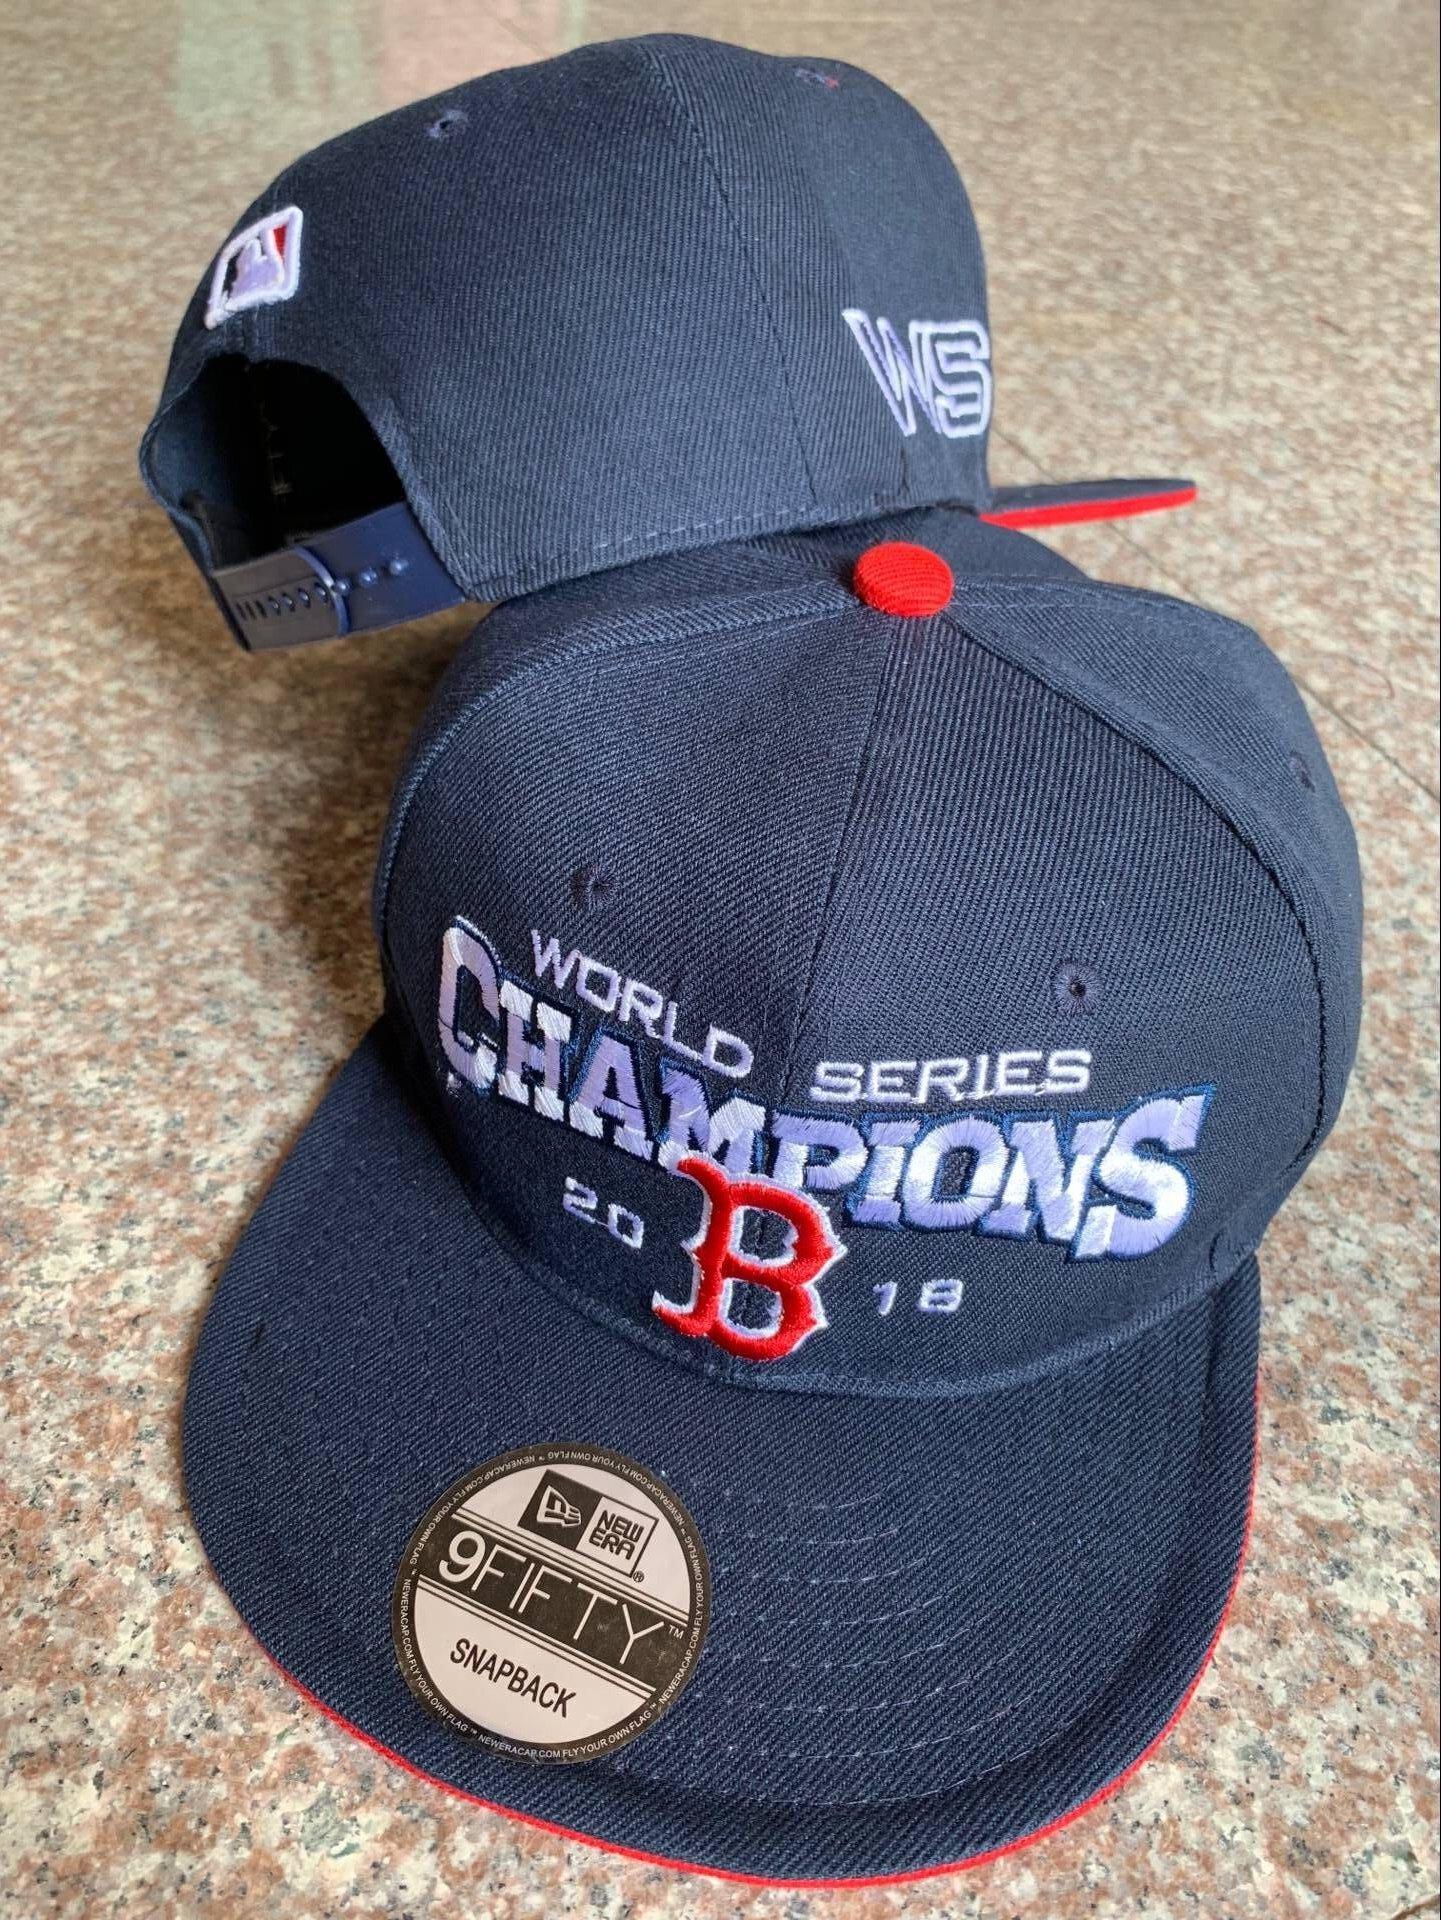 Red Sox Navy 2018 World Series Champions Adjsutable Hat YD